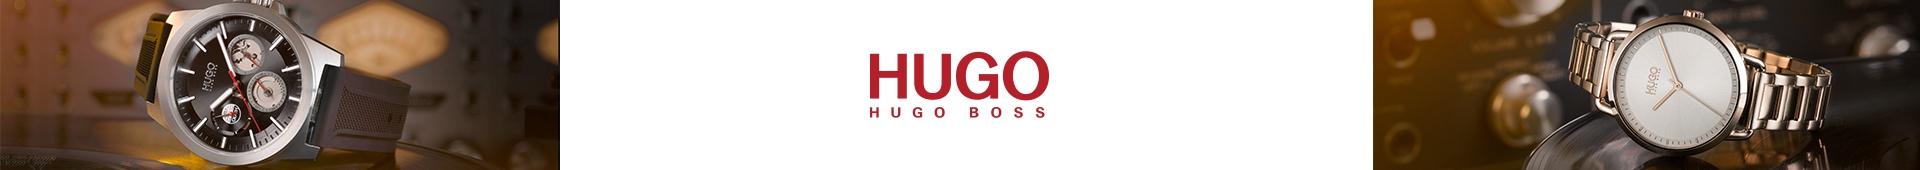 HUGO Sports